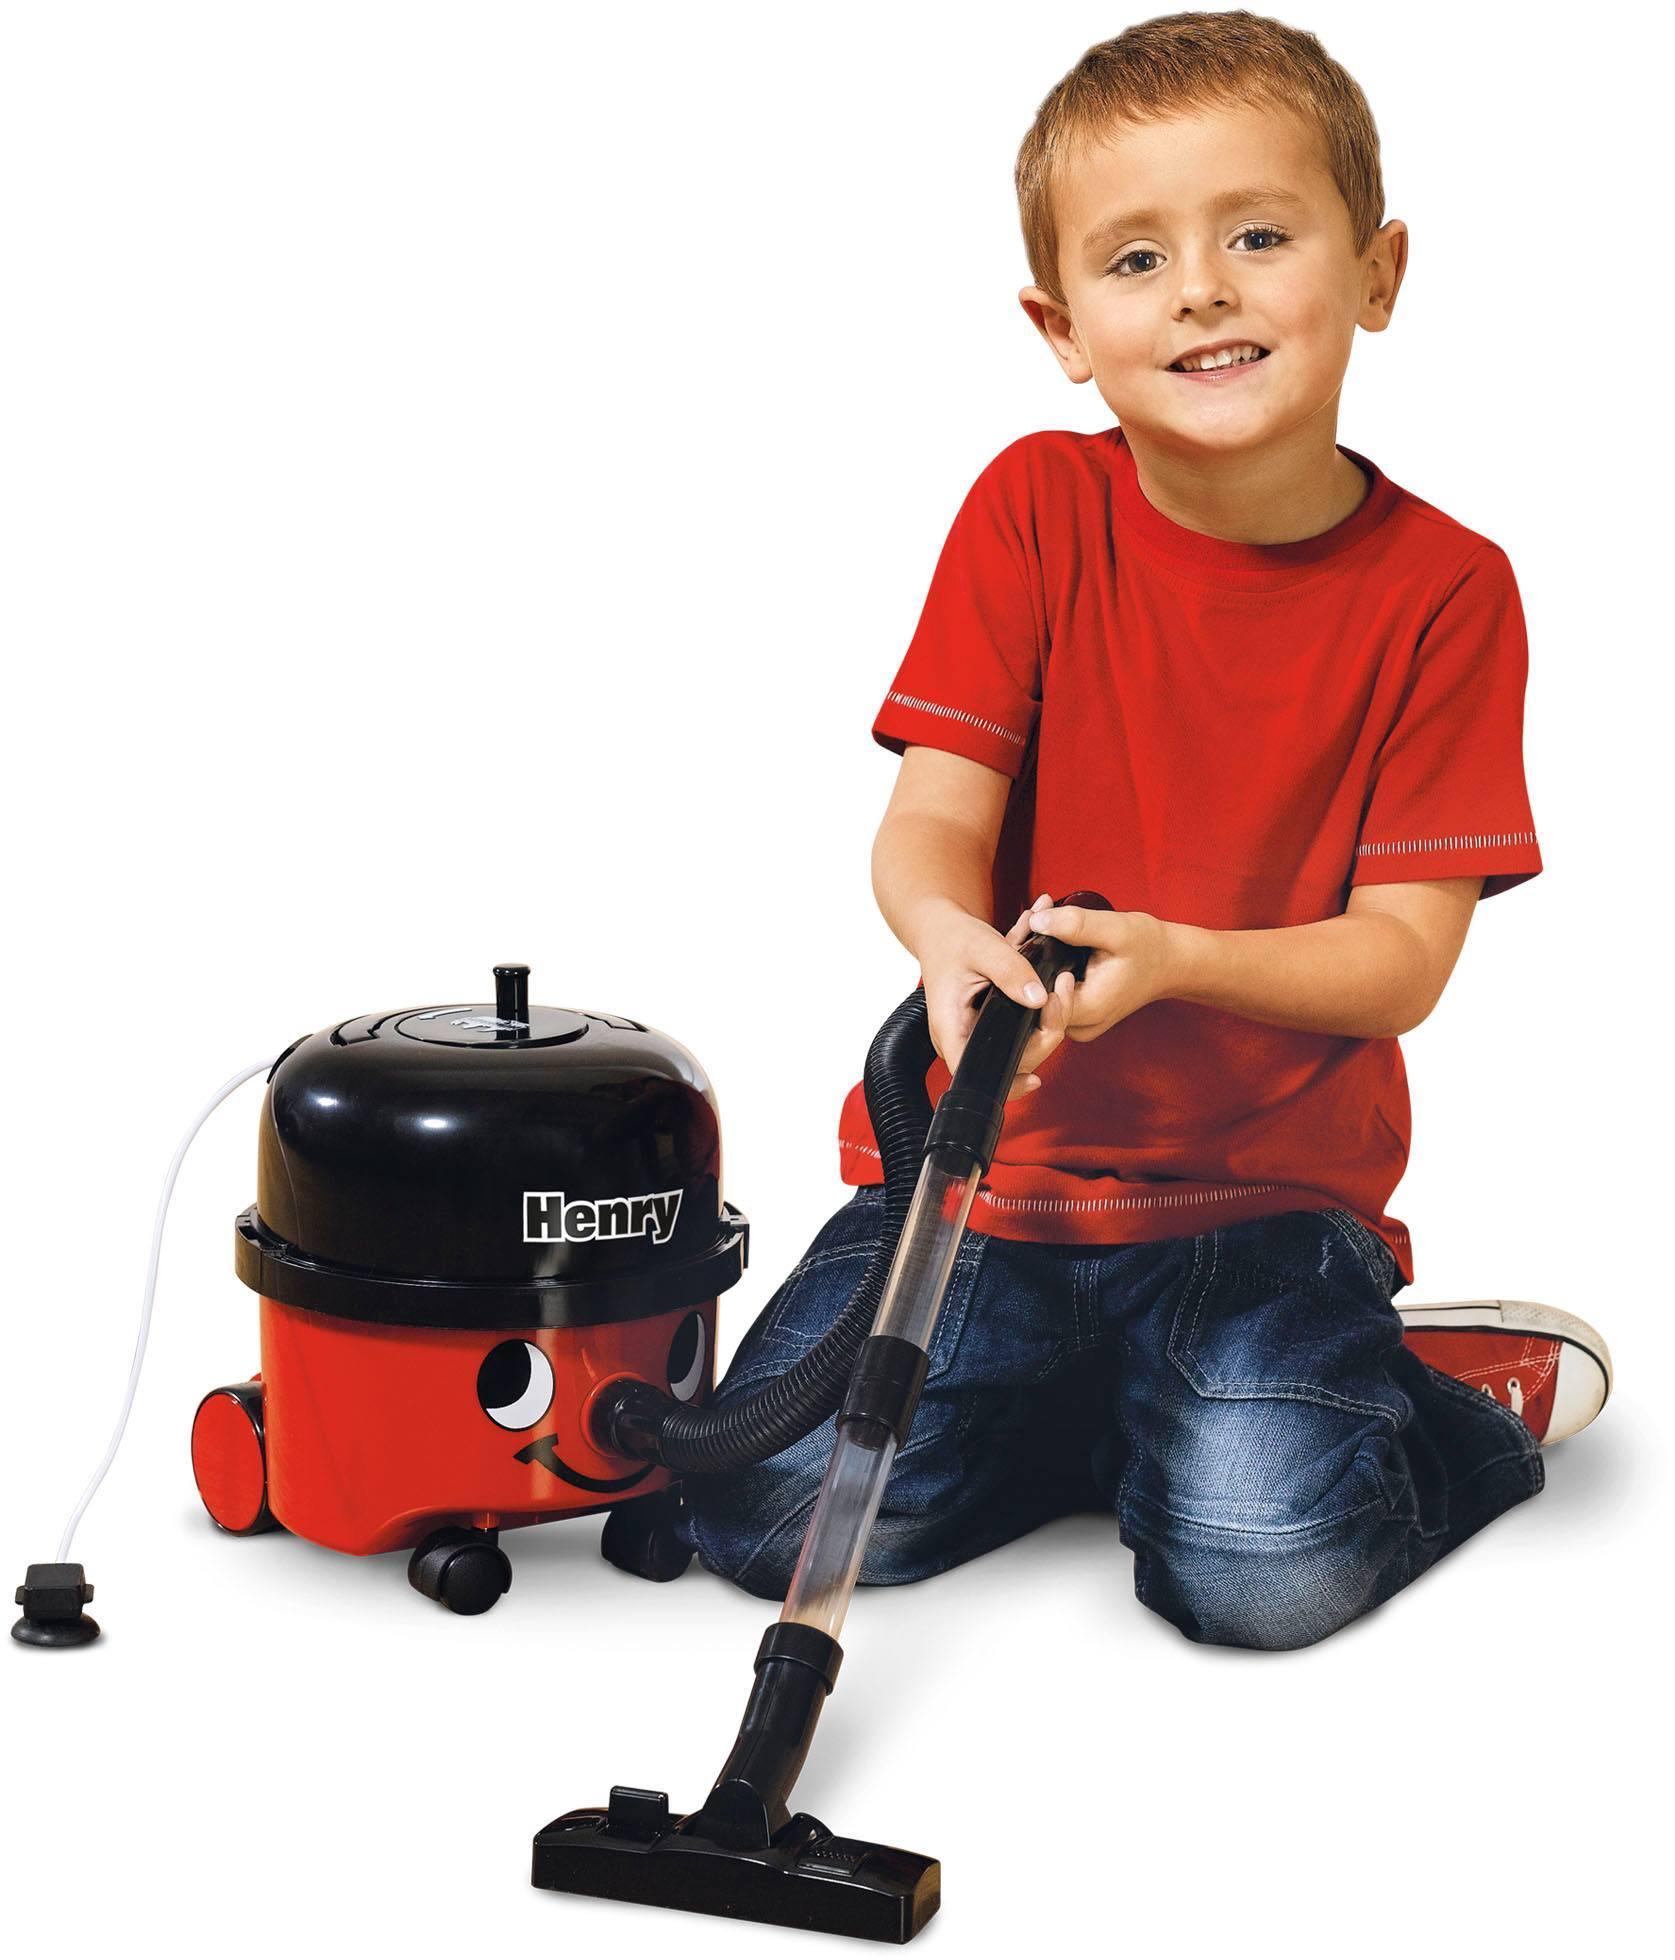 casdon henry vacuum cleaner child 39 s toy hoover pretend. Black Bedroom Furniture Sets. Home Design Ideas